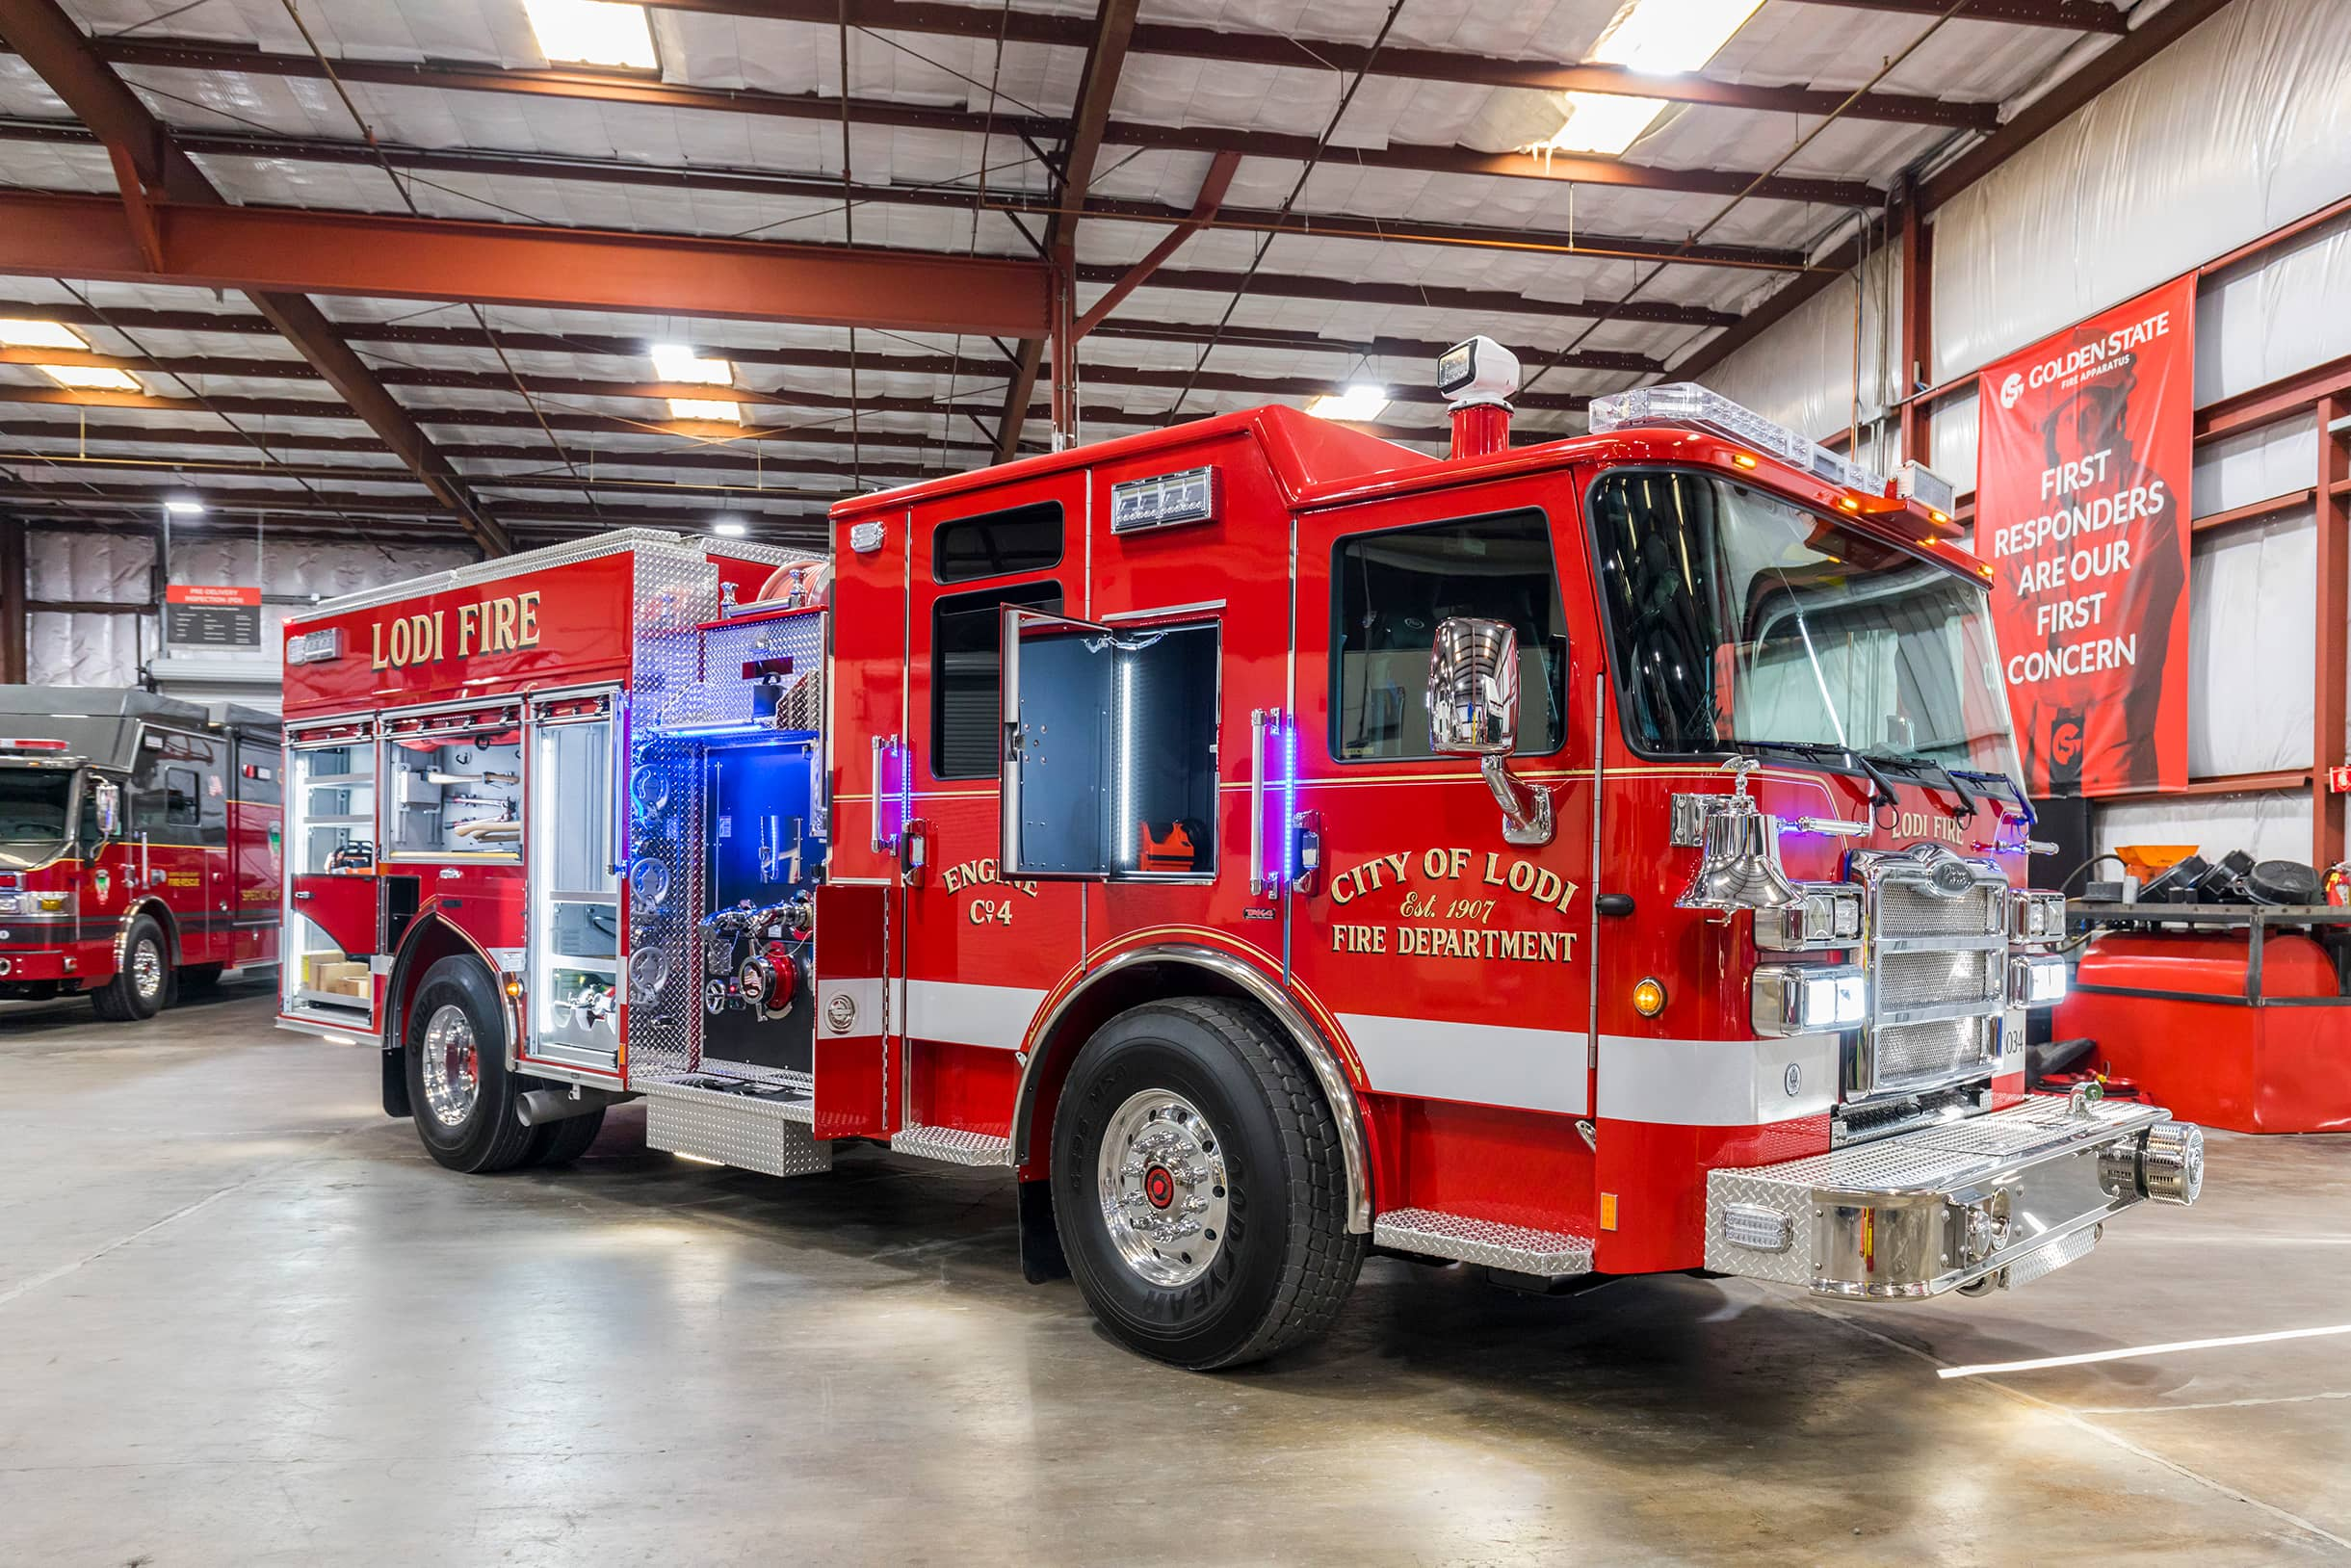 Lodi Fire Truck